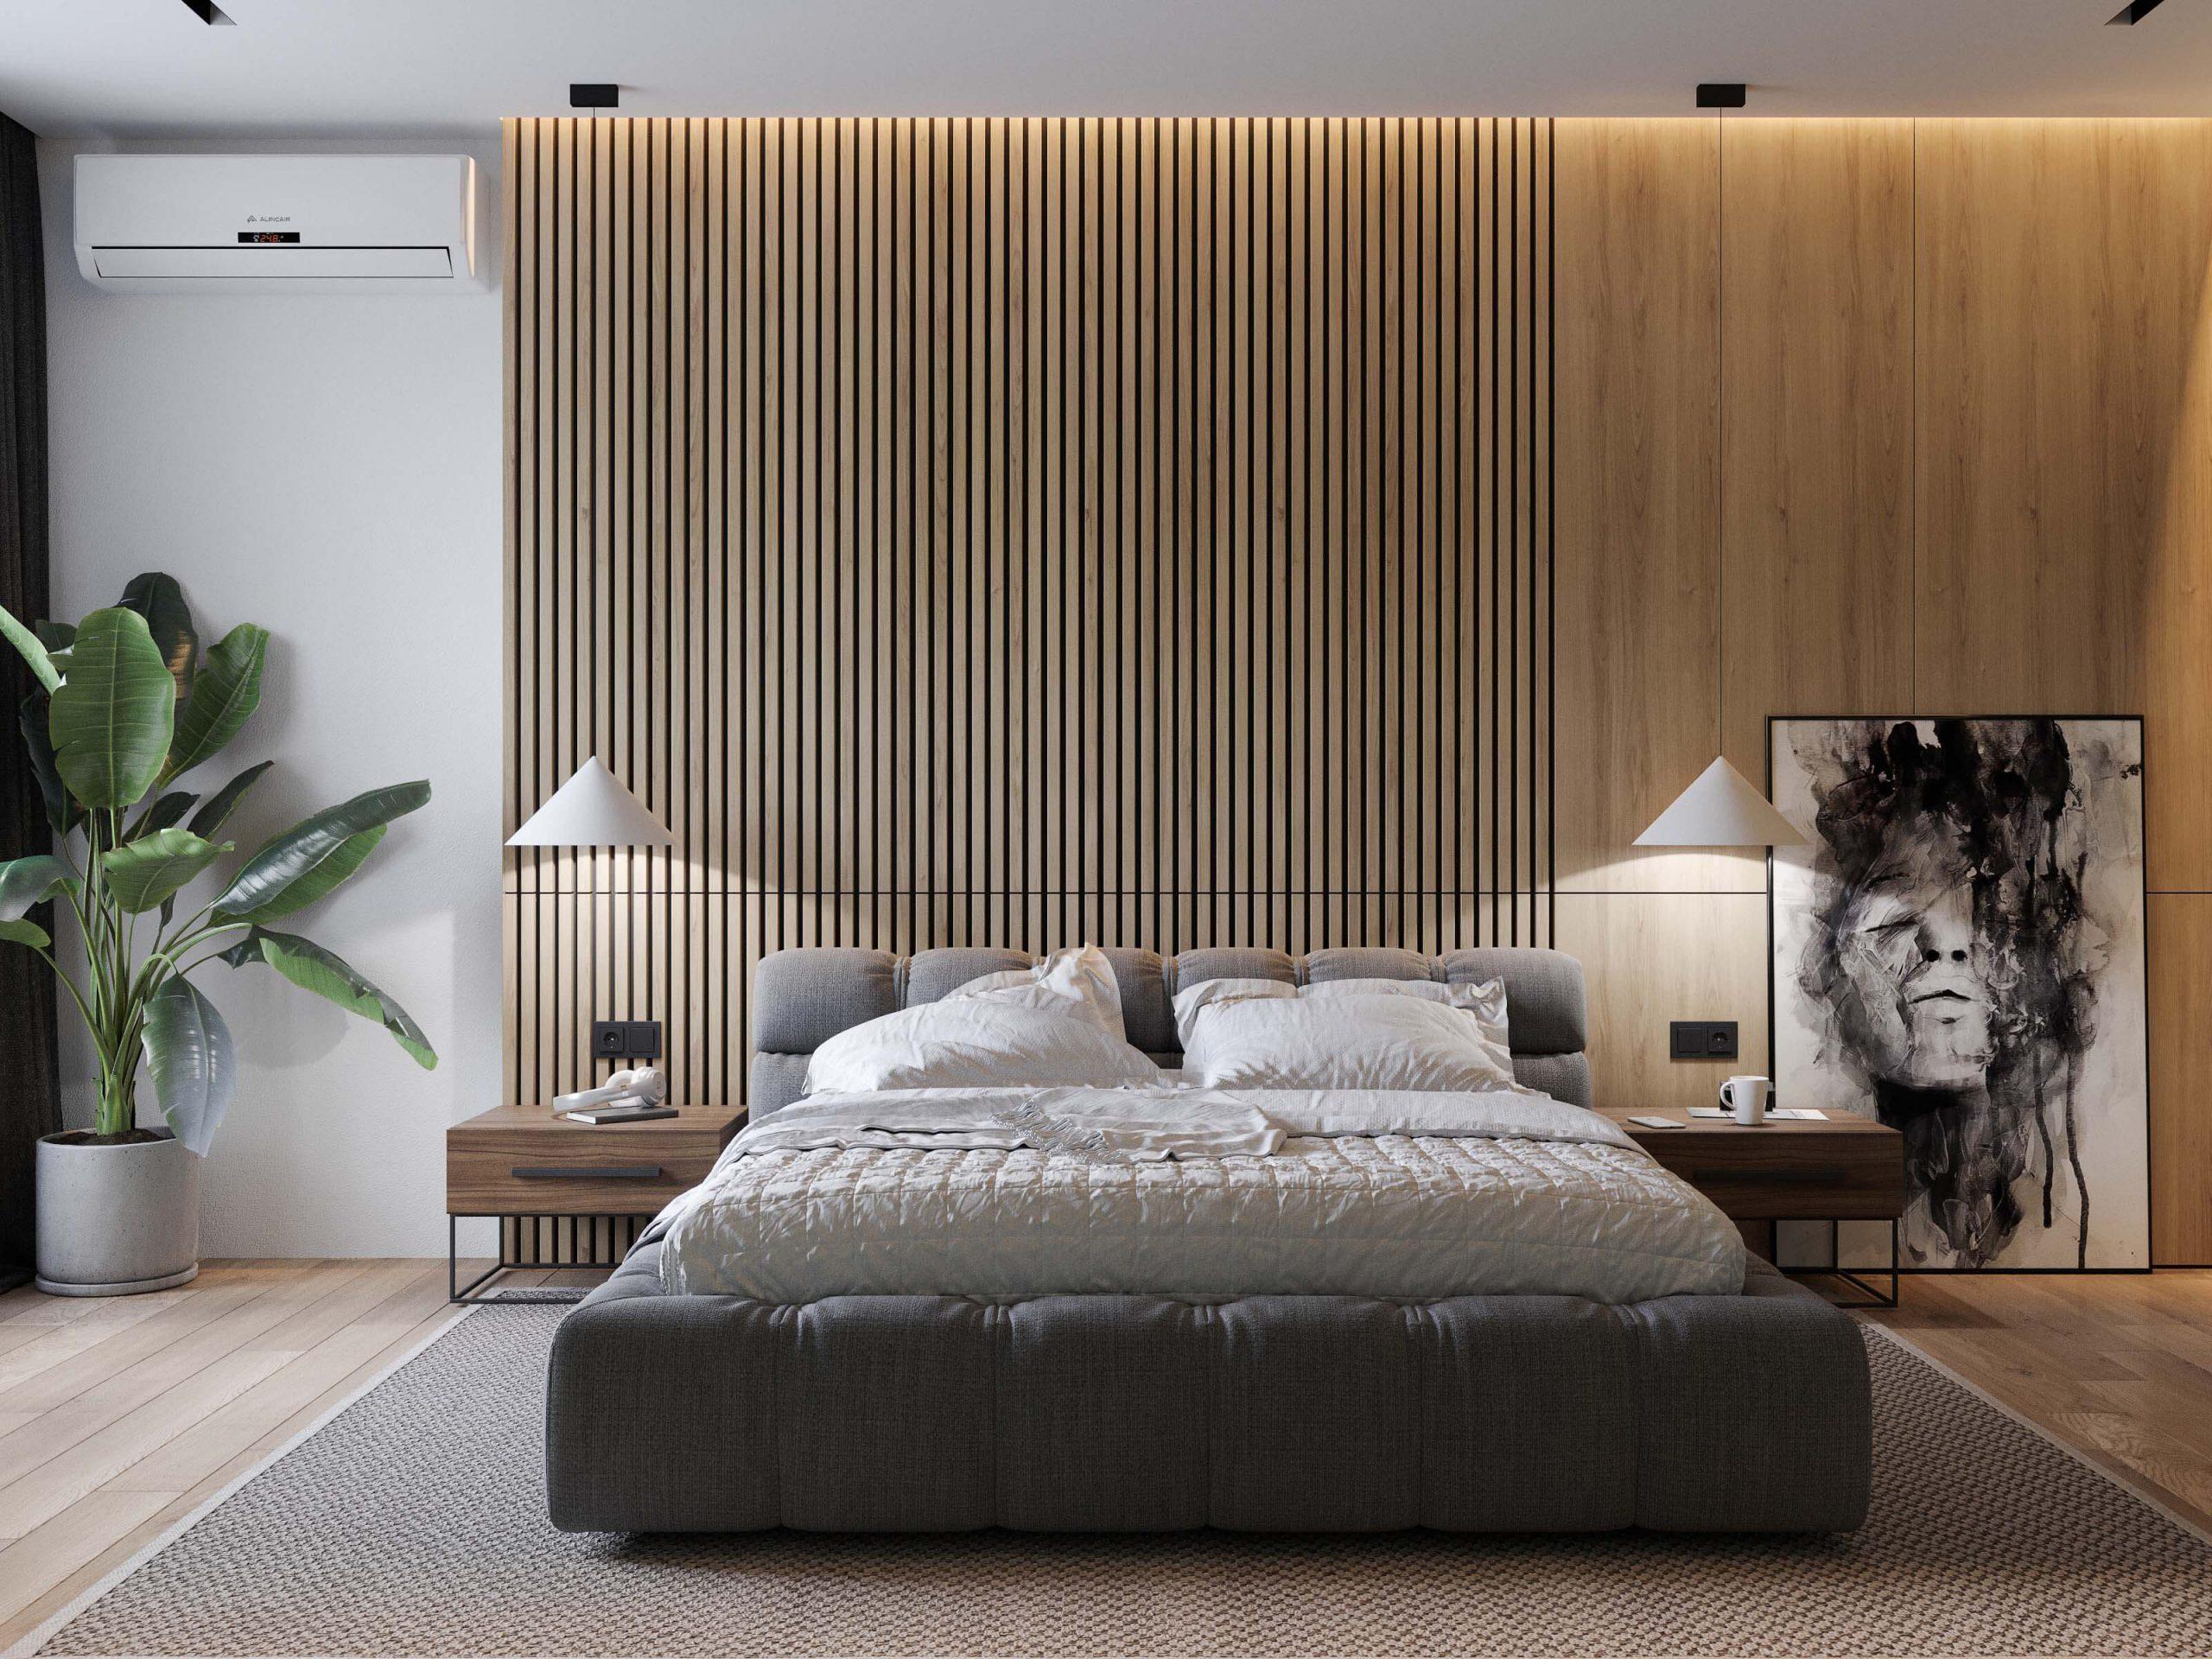 bedroom interior design in neutral colors